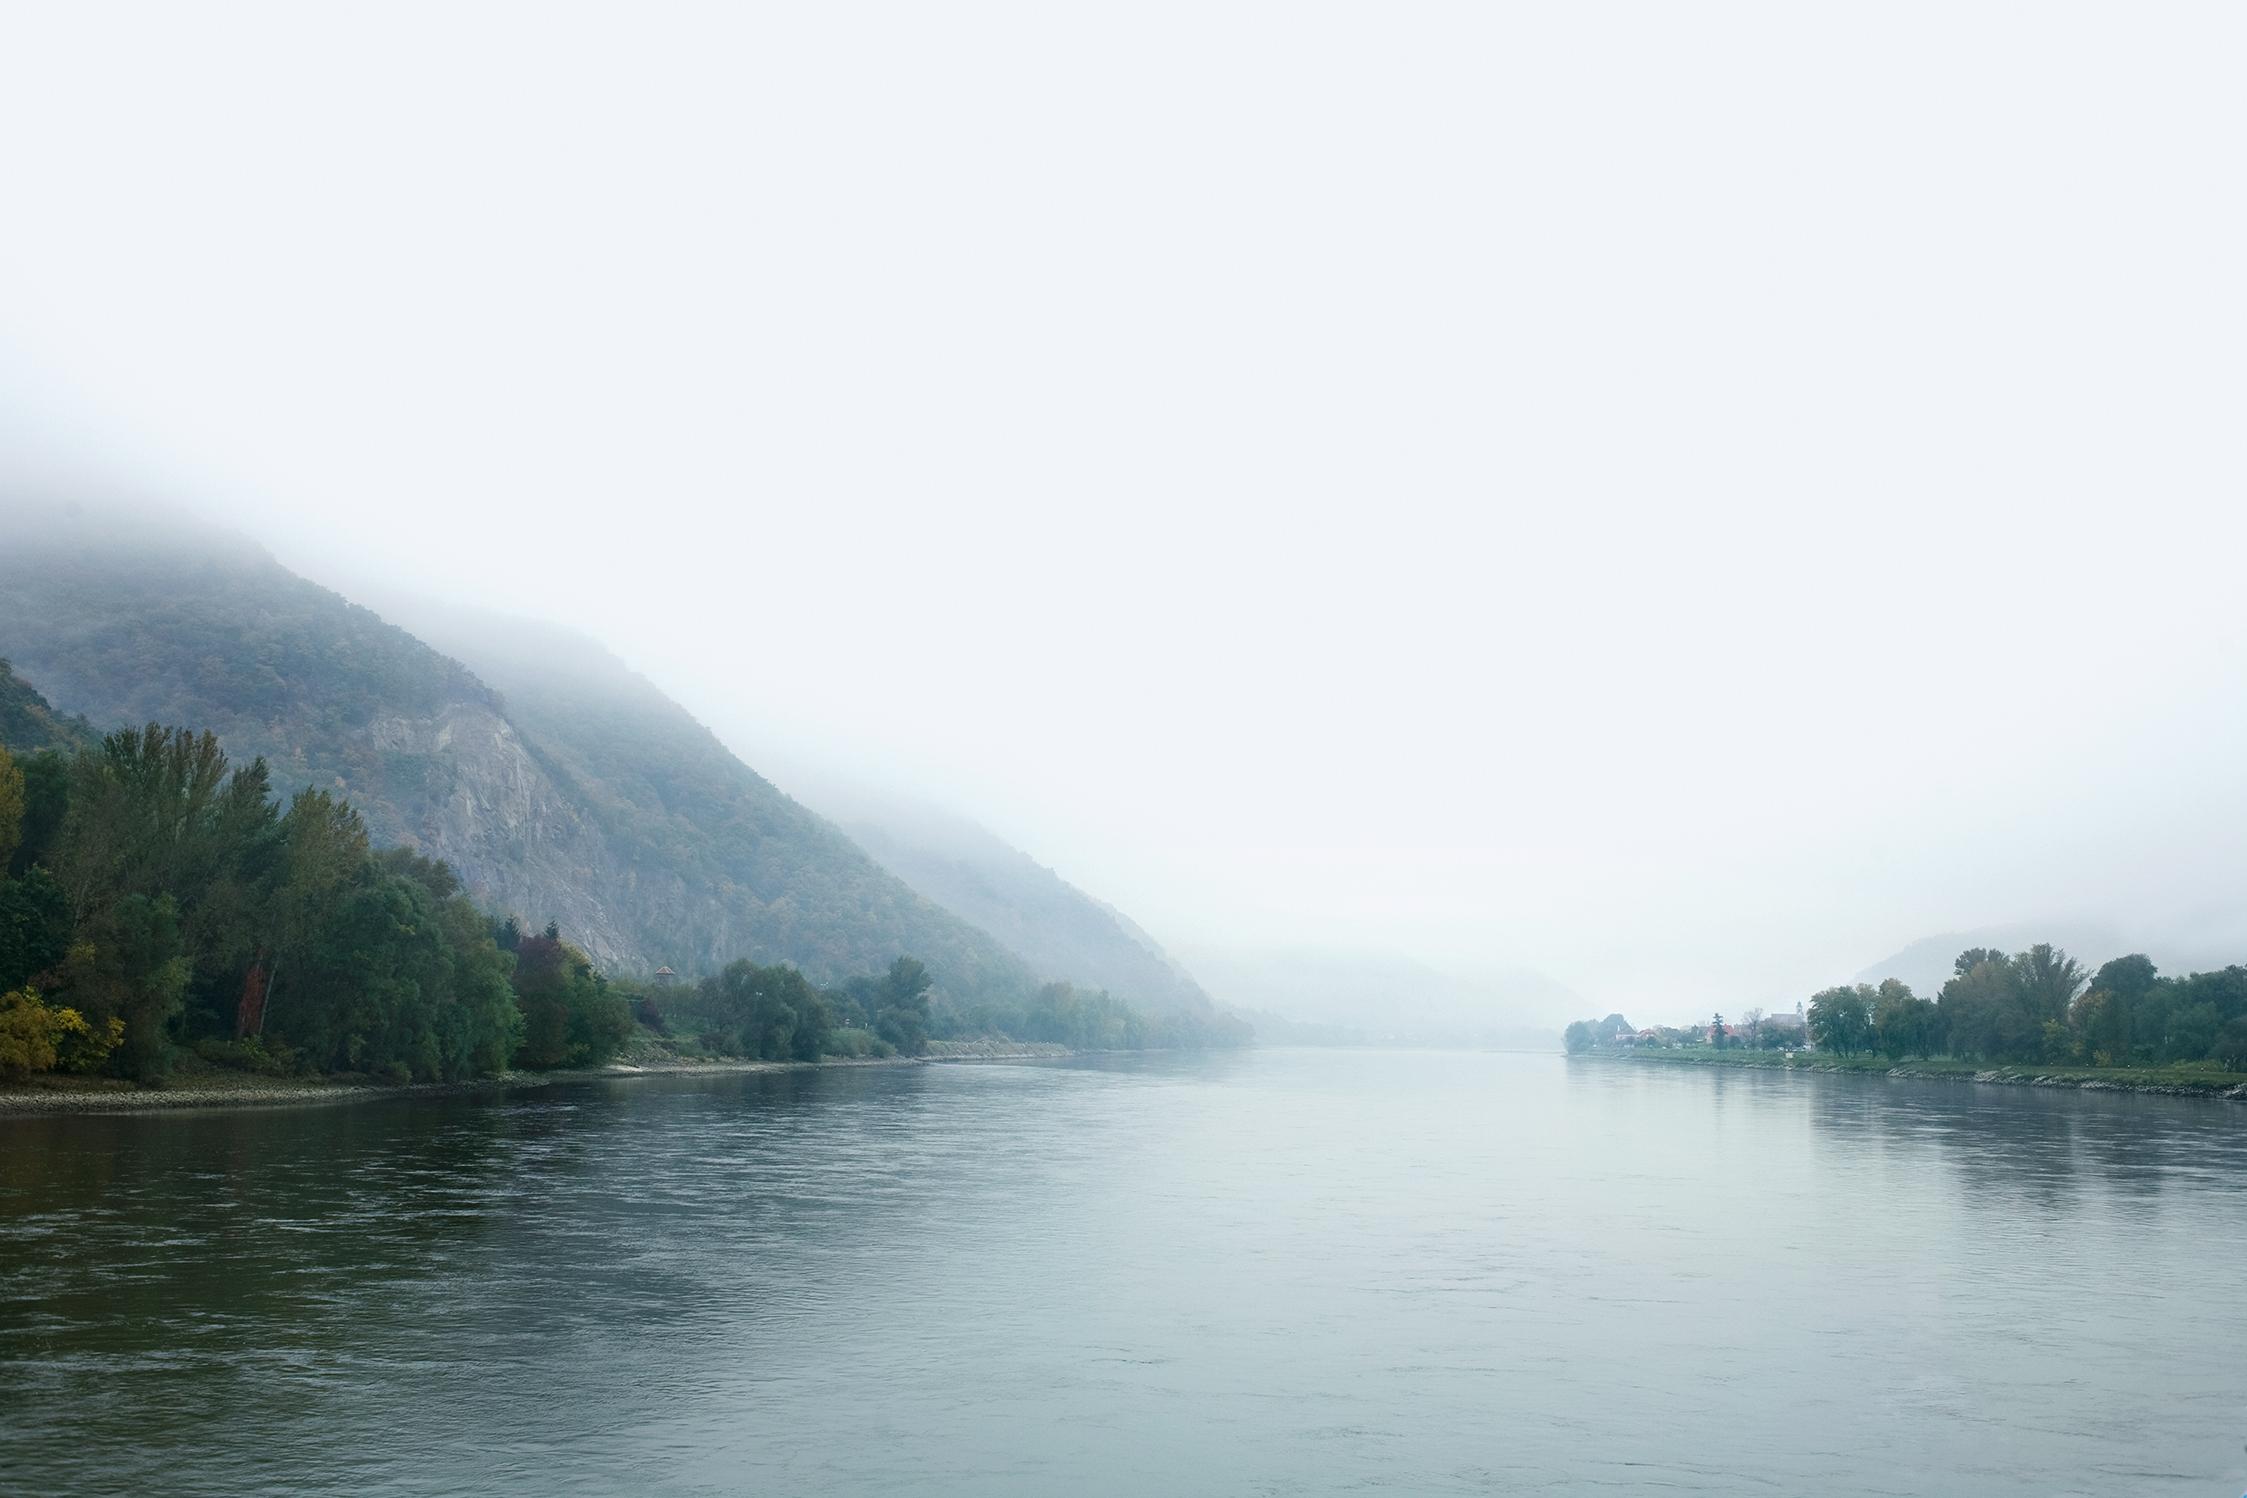 Die Donau entlang beim Welterbe Wachau